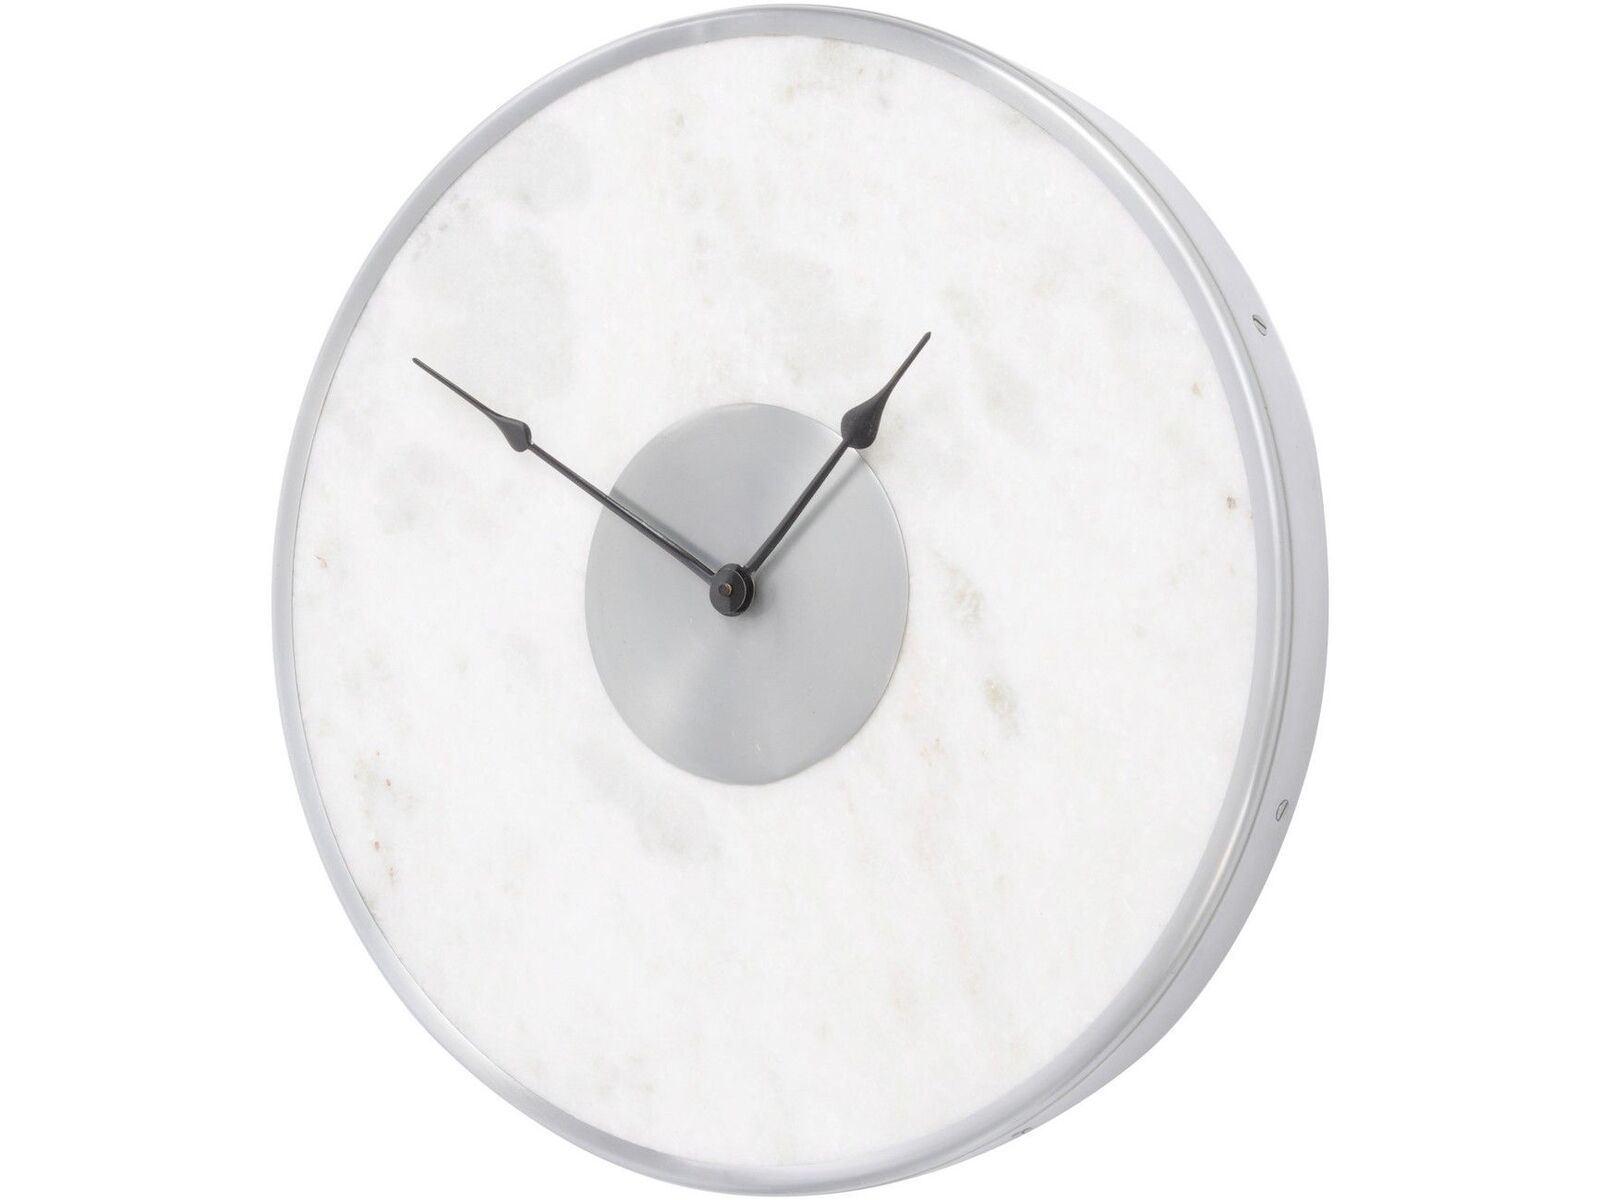 Contemporary White Marble Wall Clock Unique Art Modern House Decor 46cm 5013622152069 Ebay